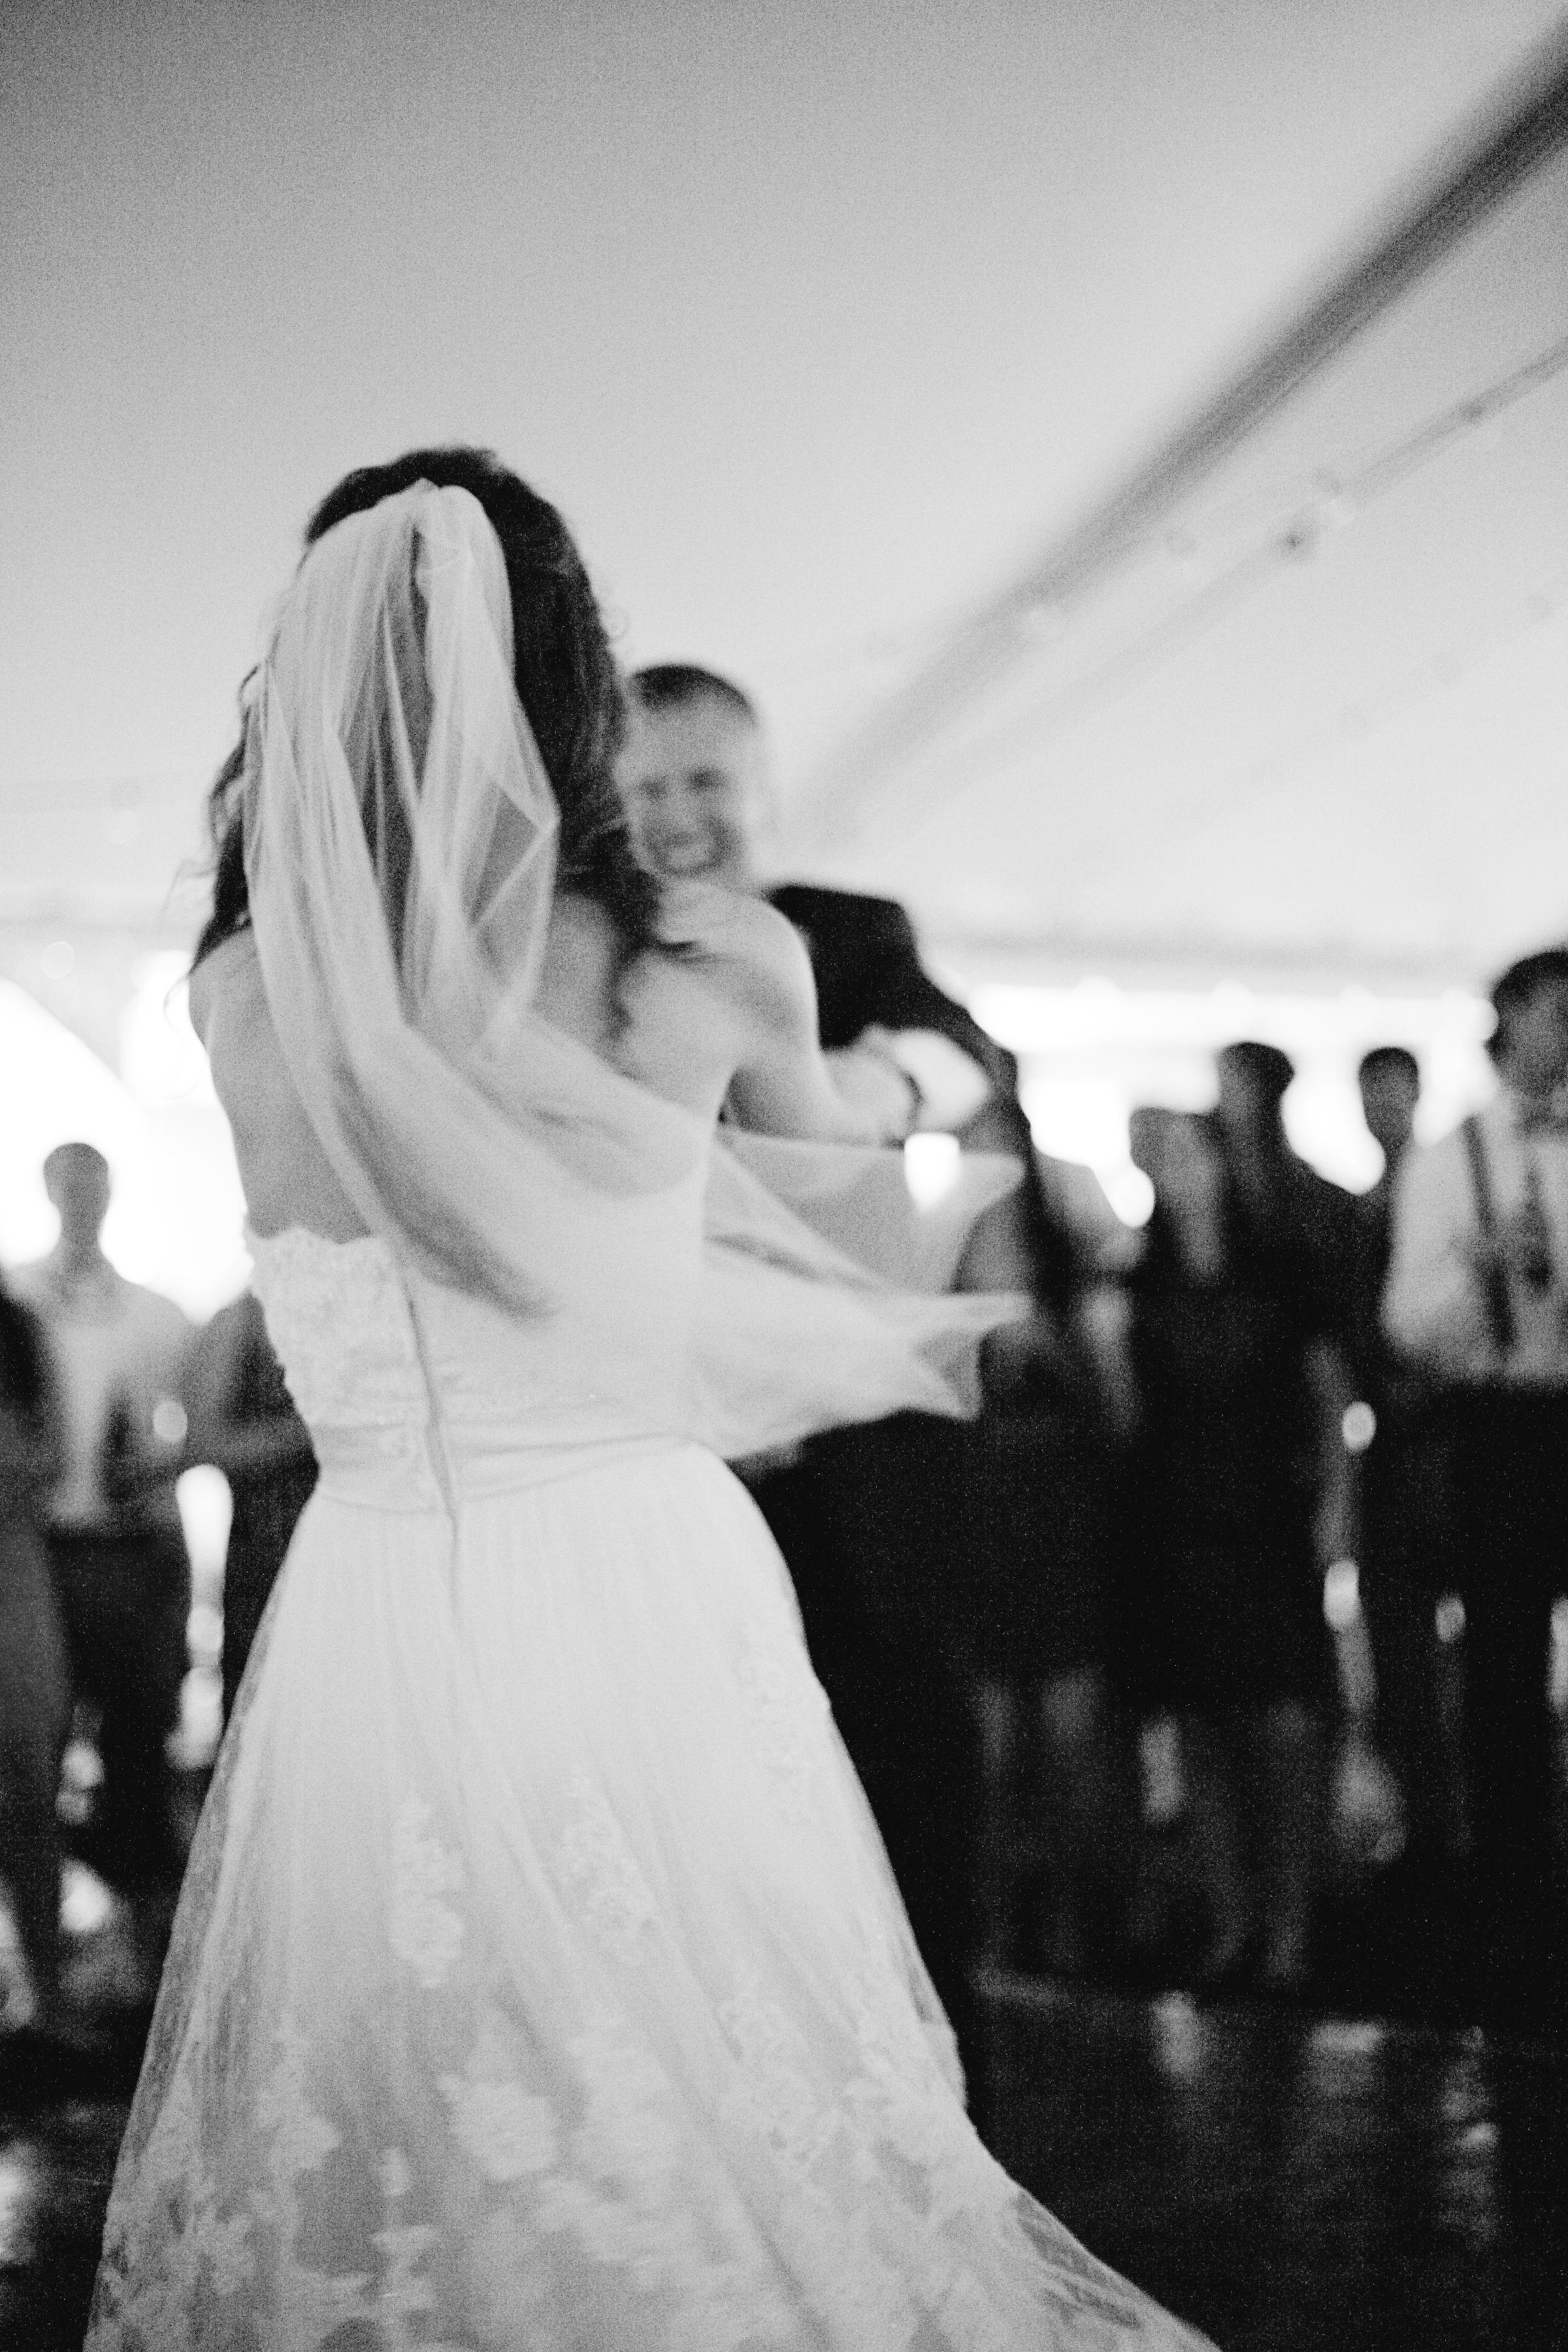 st_simons_island_wedding_photographer_shannon_griffin_0042.jpg